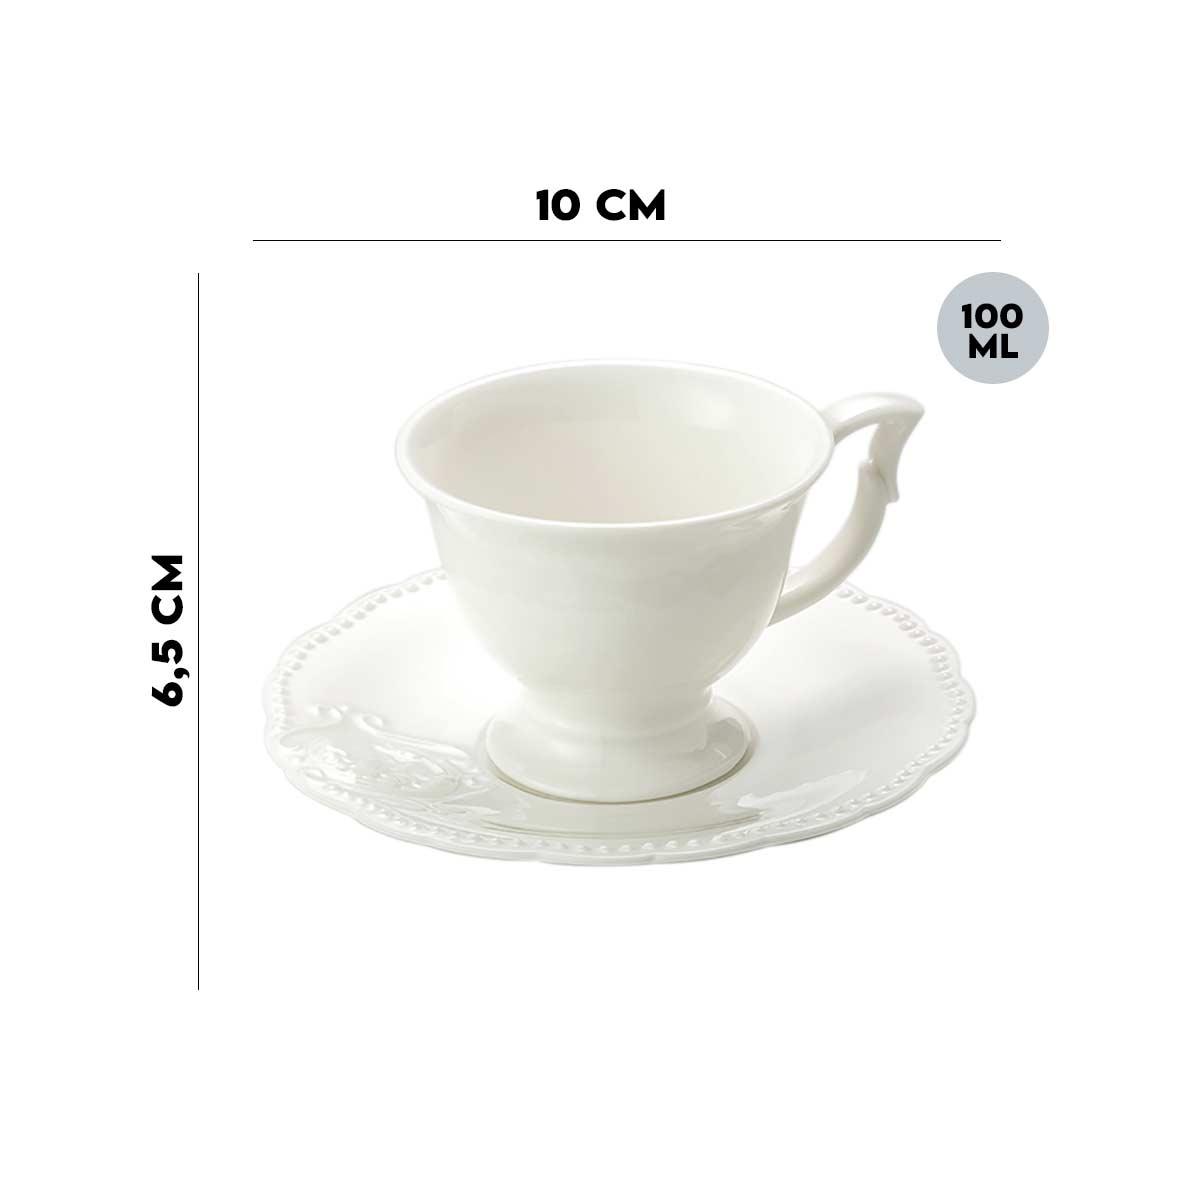 Jogo 8 Xícaras p/Café c/Pires de Porcelana Branco 100ml Lyor  - Lemis